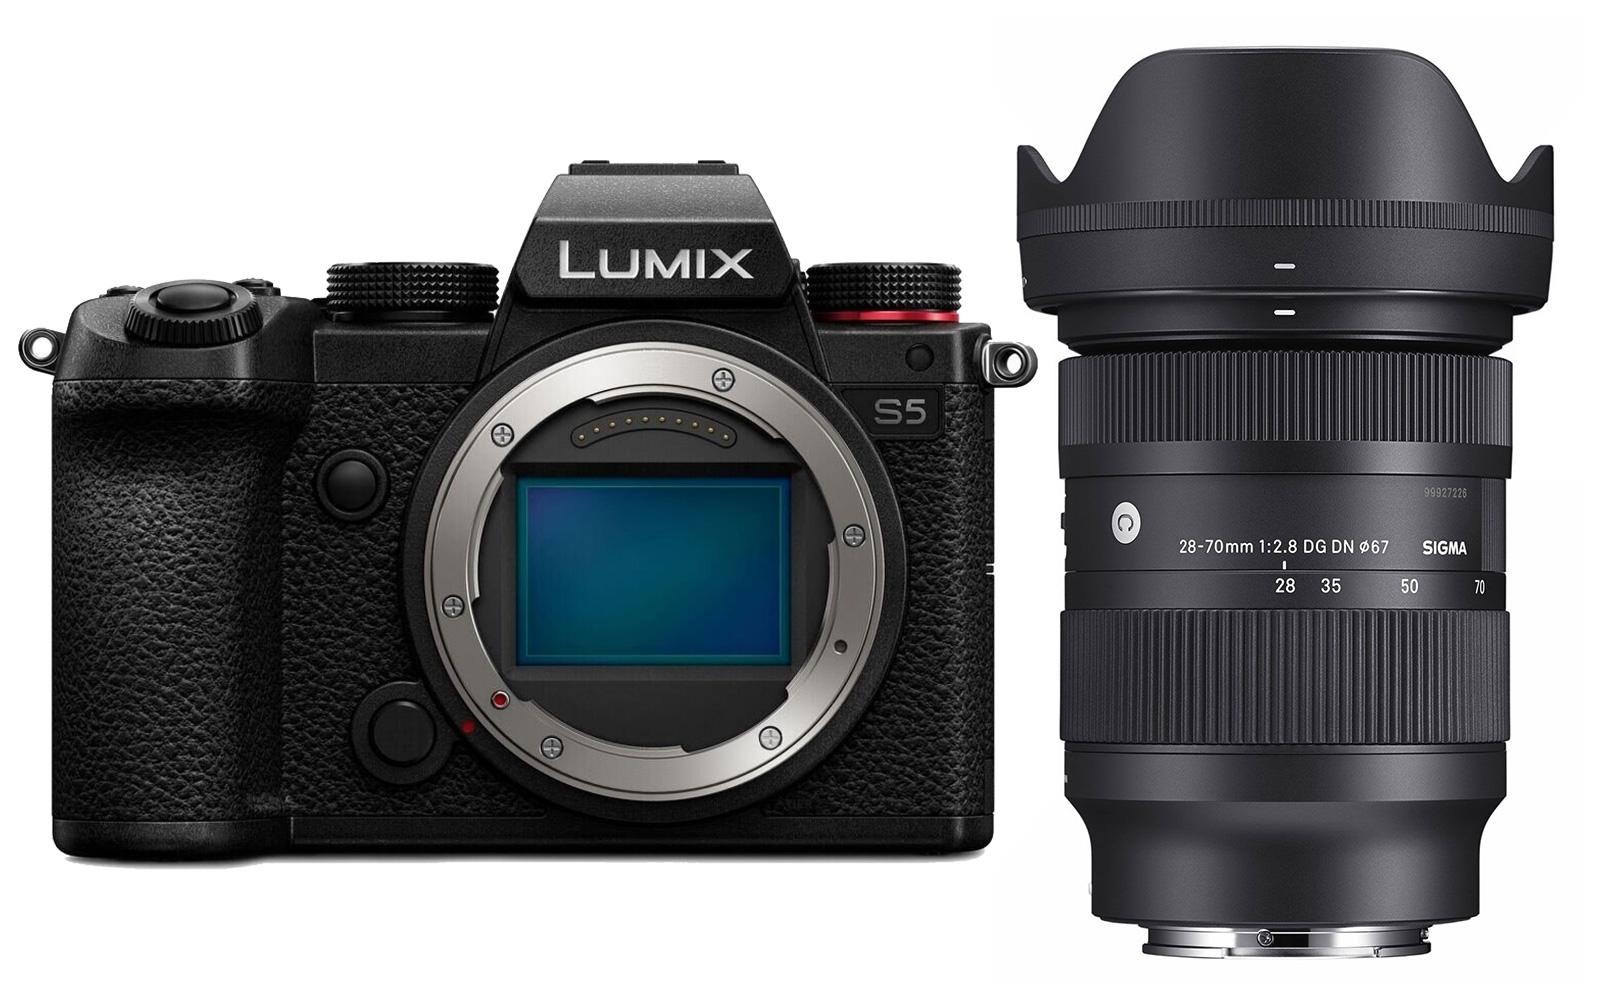 Panasonic LUMIX DC-S5 (DC-S5E-K) + Sigma C 28-70mm 2.8 DG DN für L-Mount